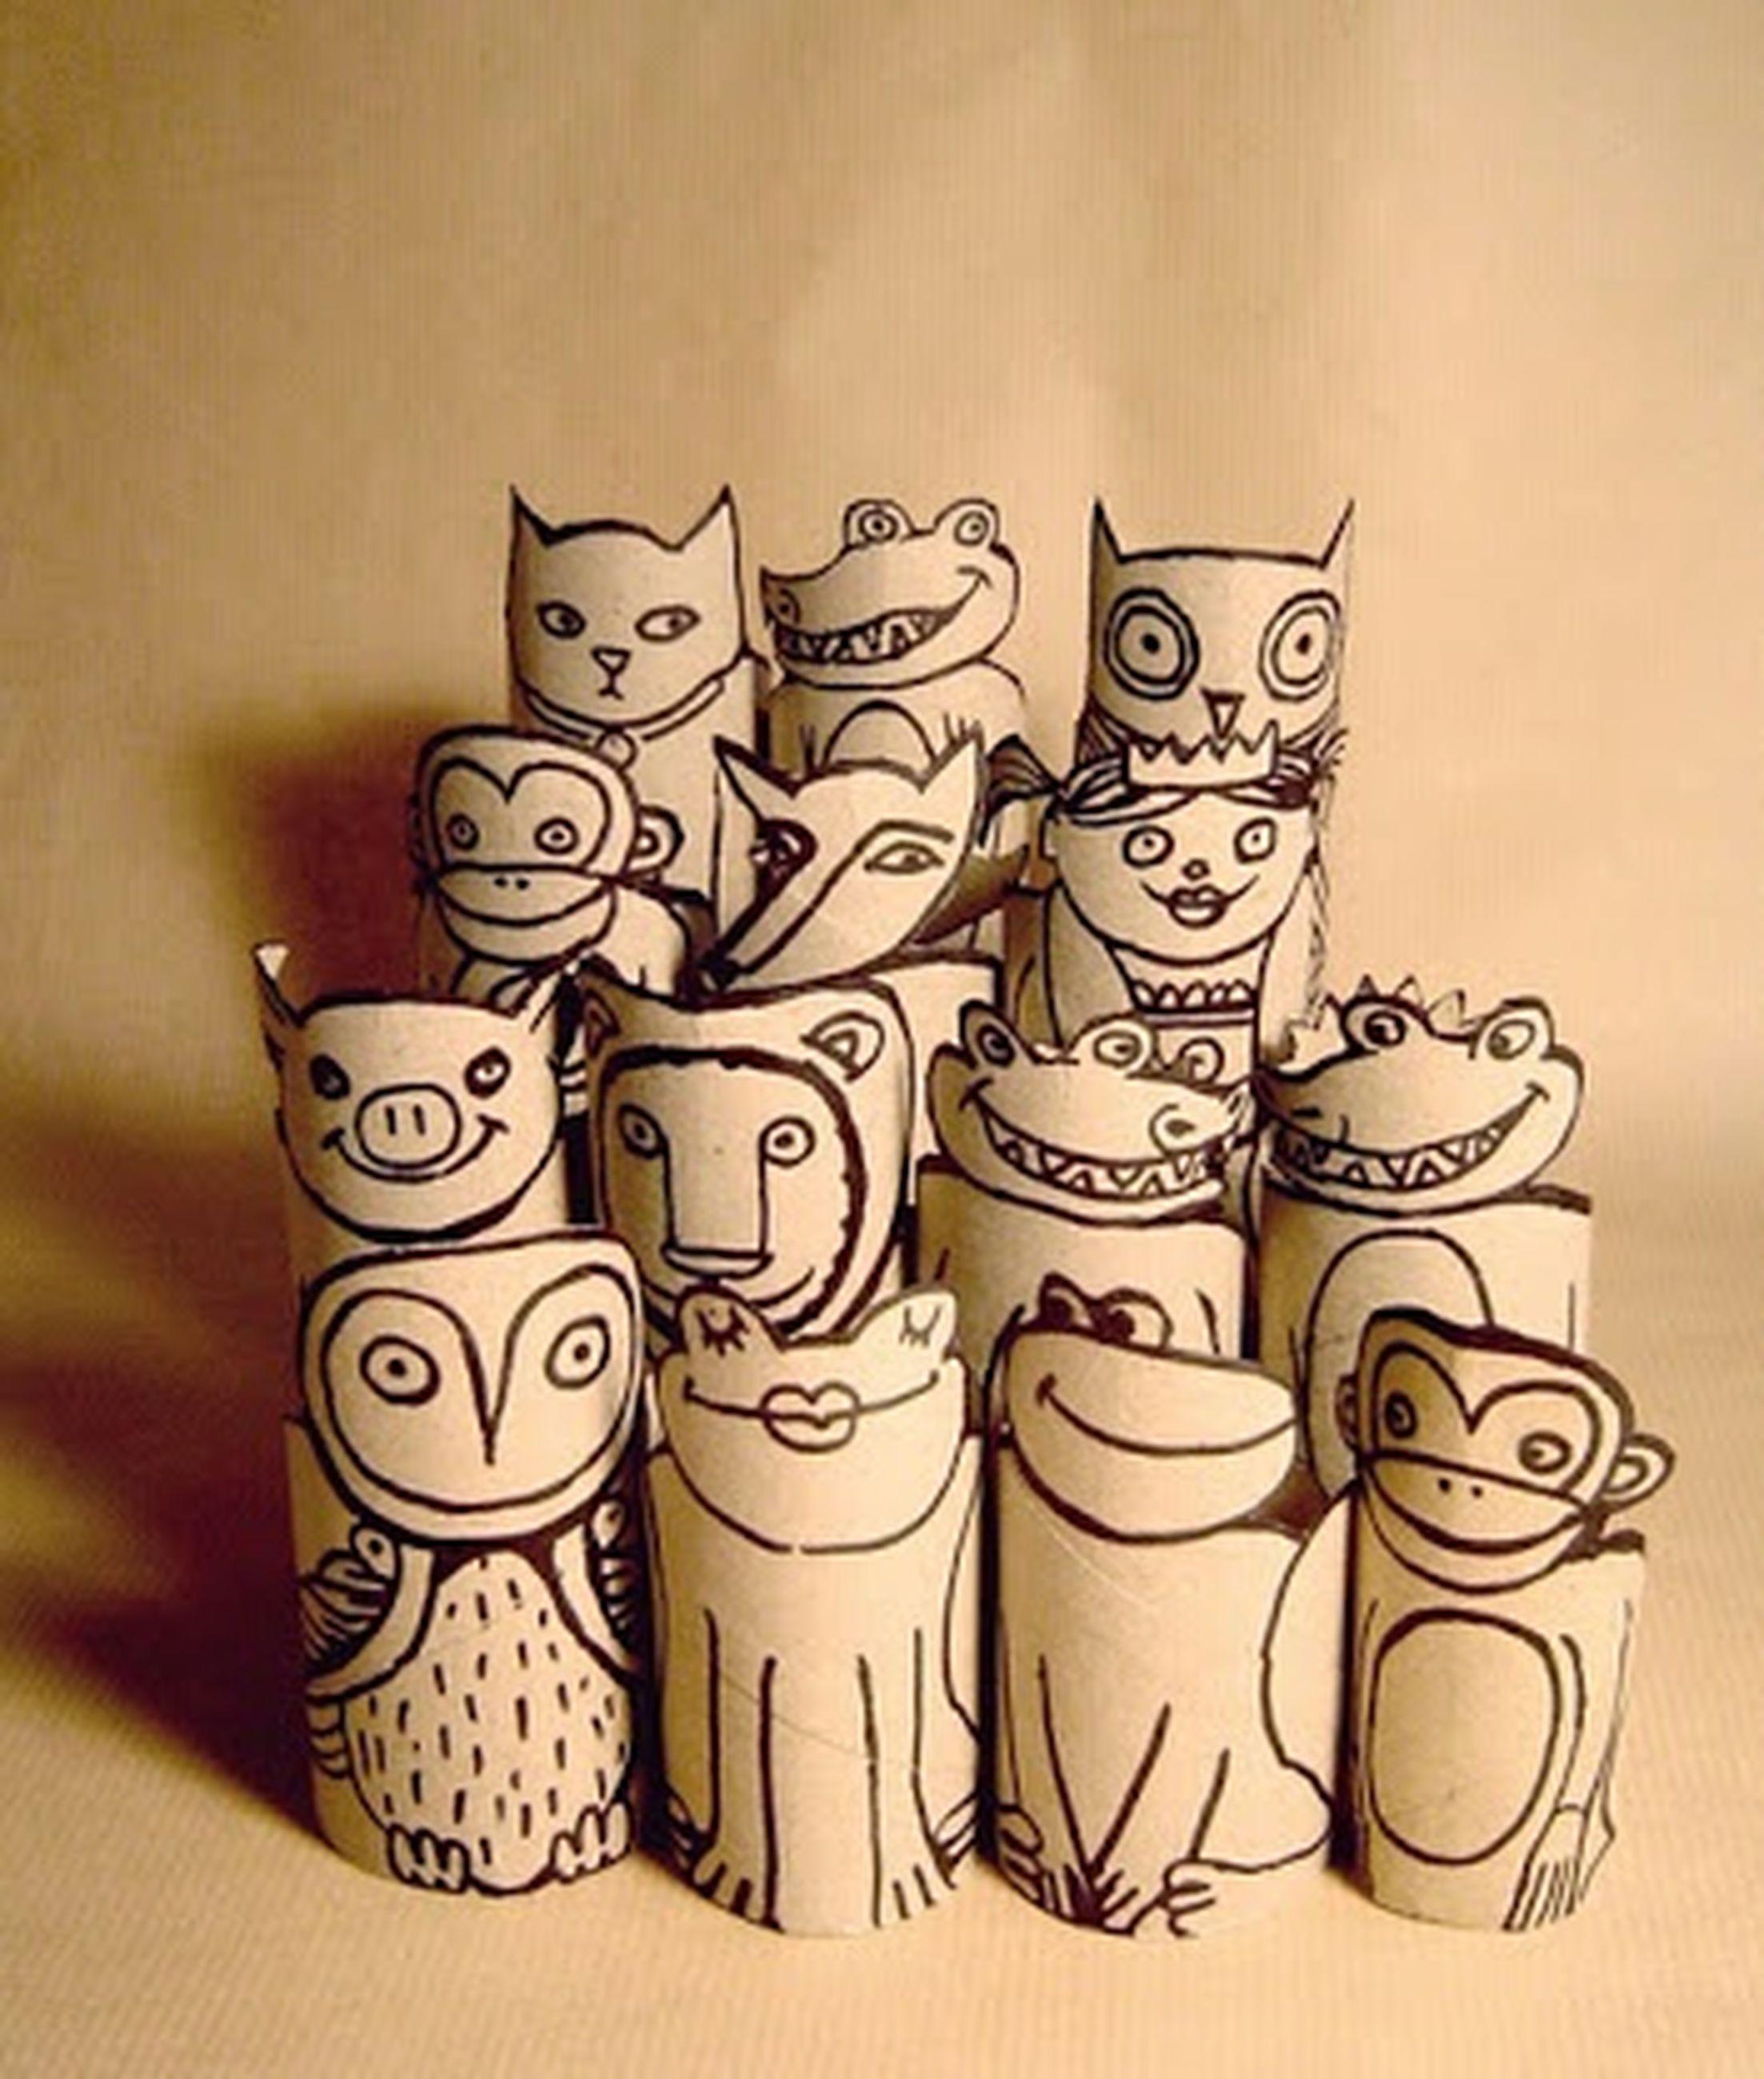 indoors, art, art and craft, creativity, wall - building feature, design, human representation, still life, animal representation, close-up, no people, pattern, table, craft, graffiti, metal, ideas, wall, home interior